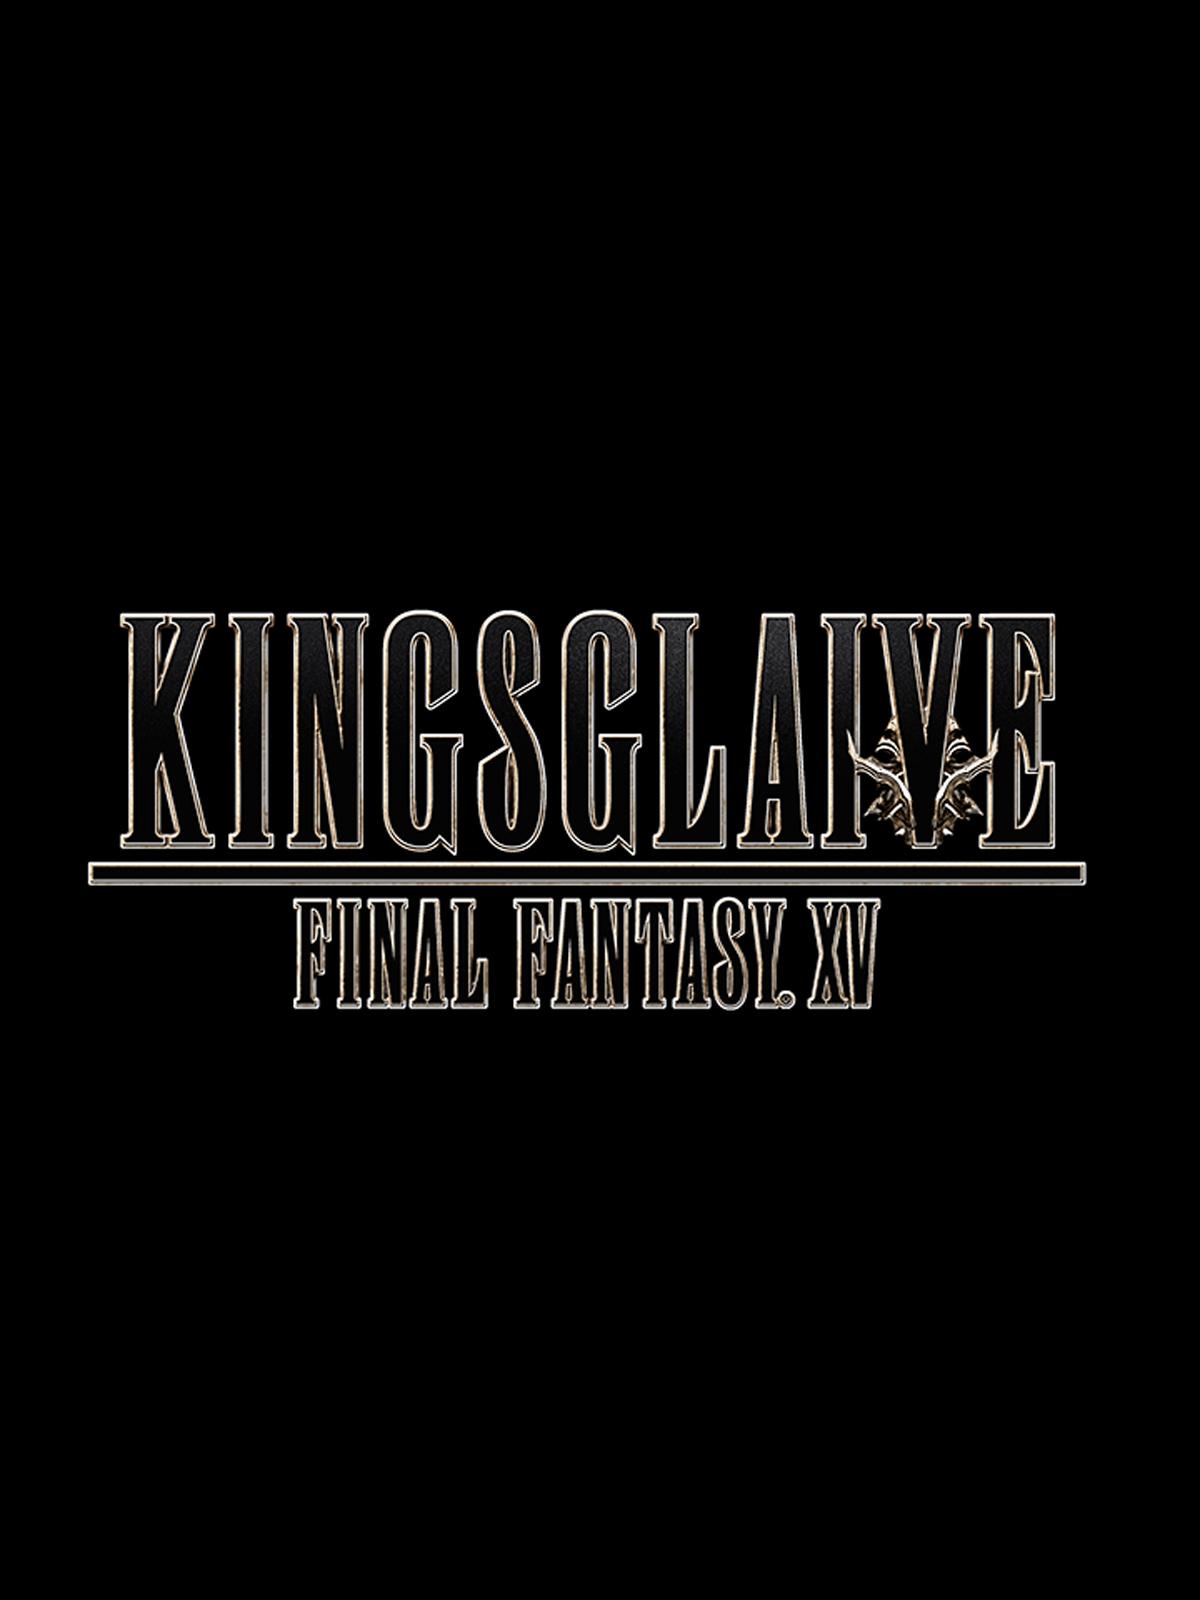 Kingsglaive: Final Fantasy XV ddl